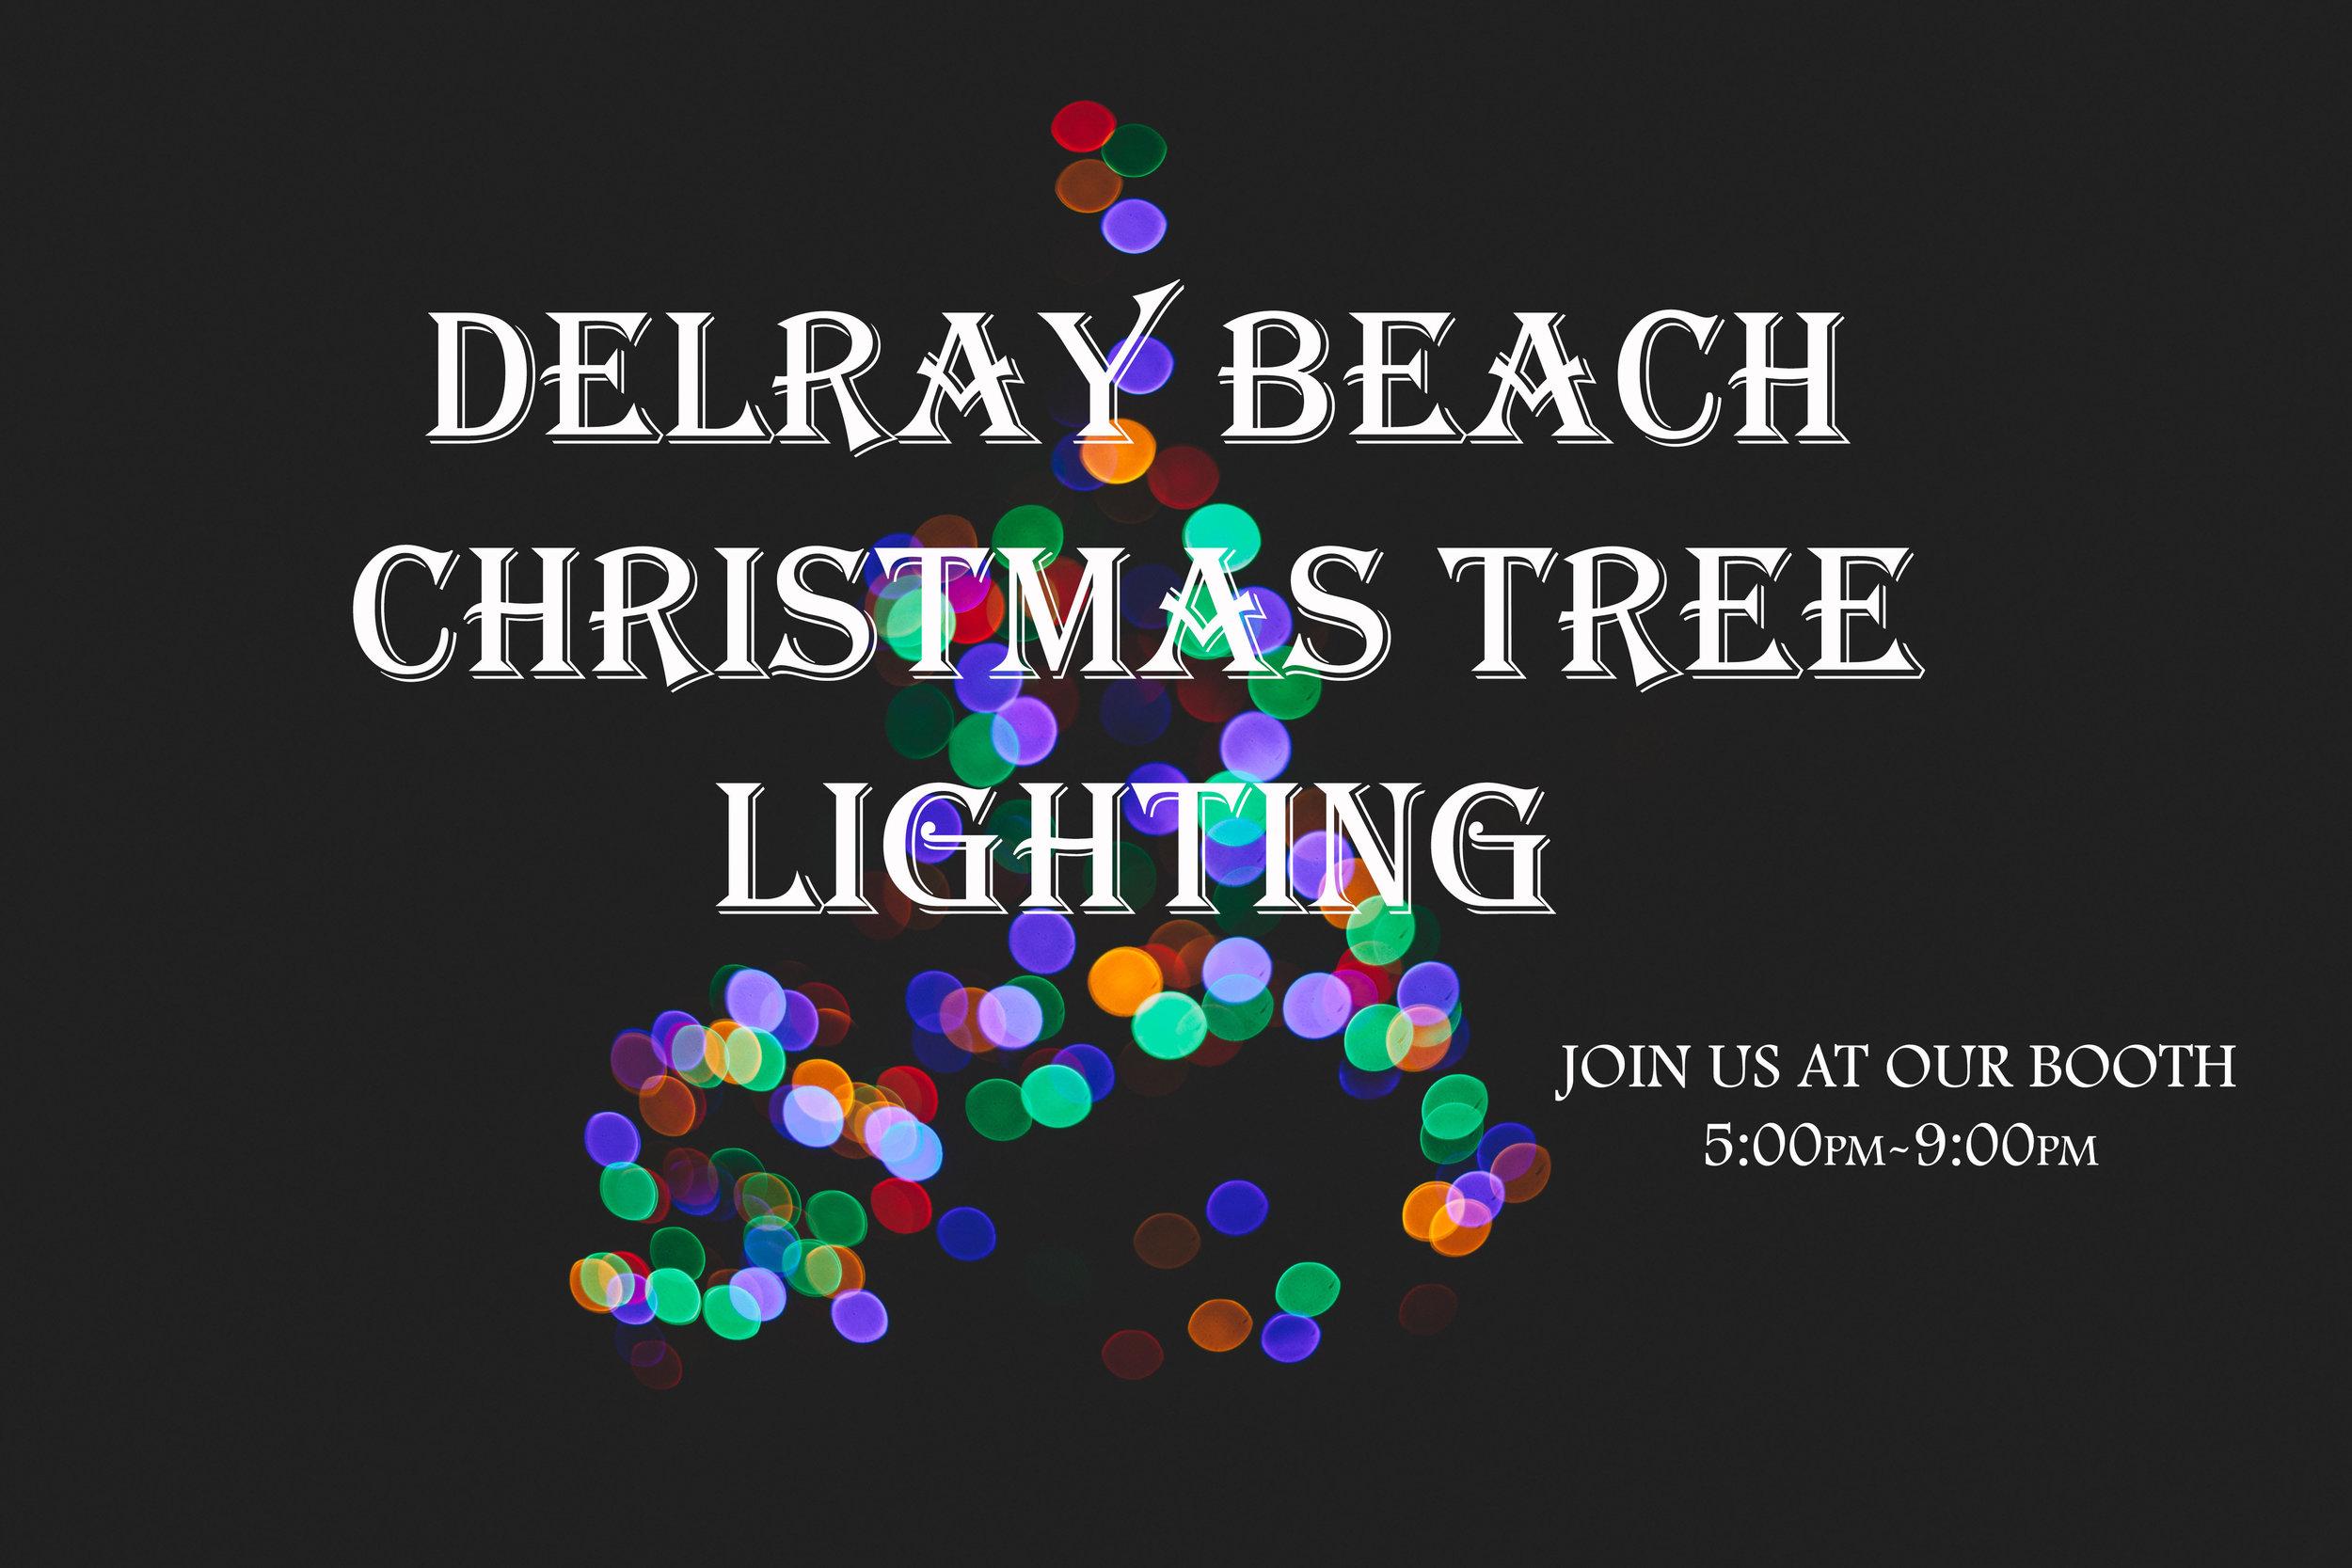 Delray Beach Christmas Tree Lighting The Avenue Church